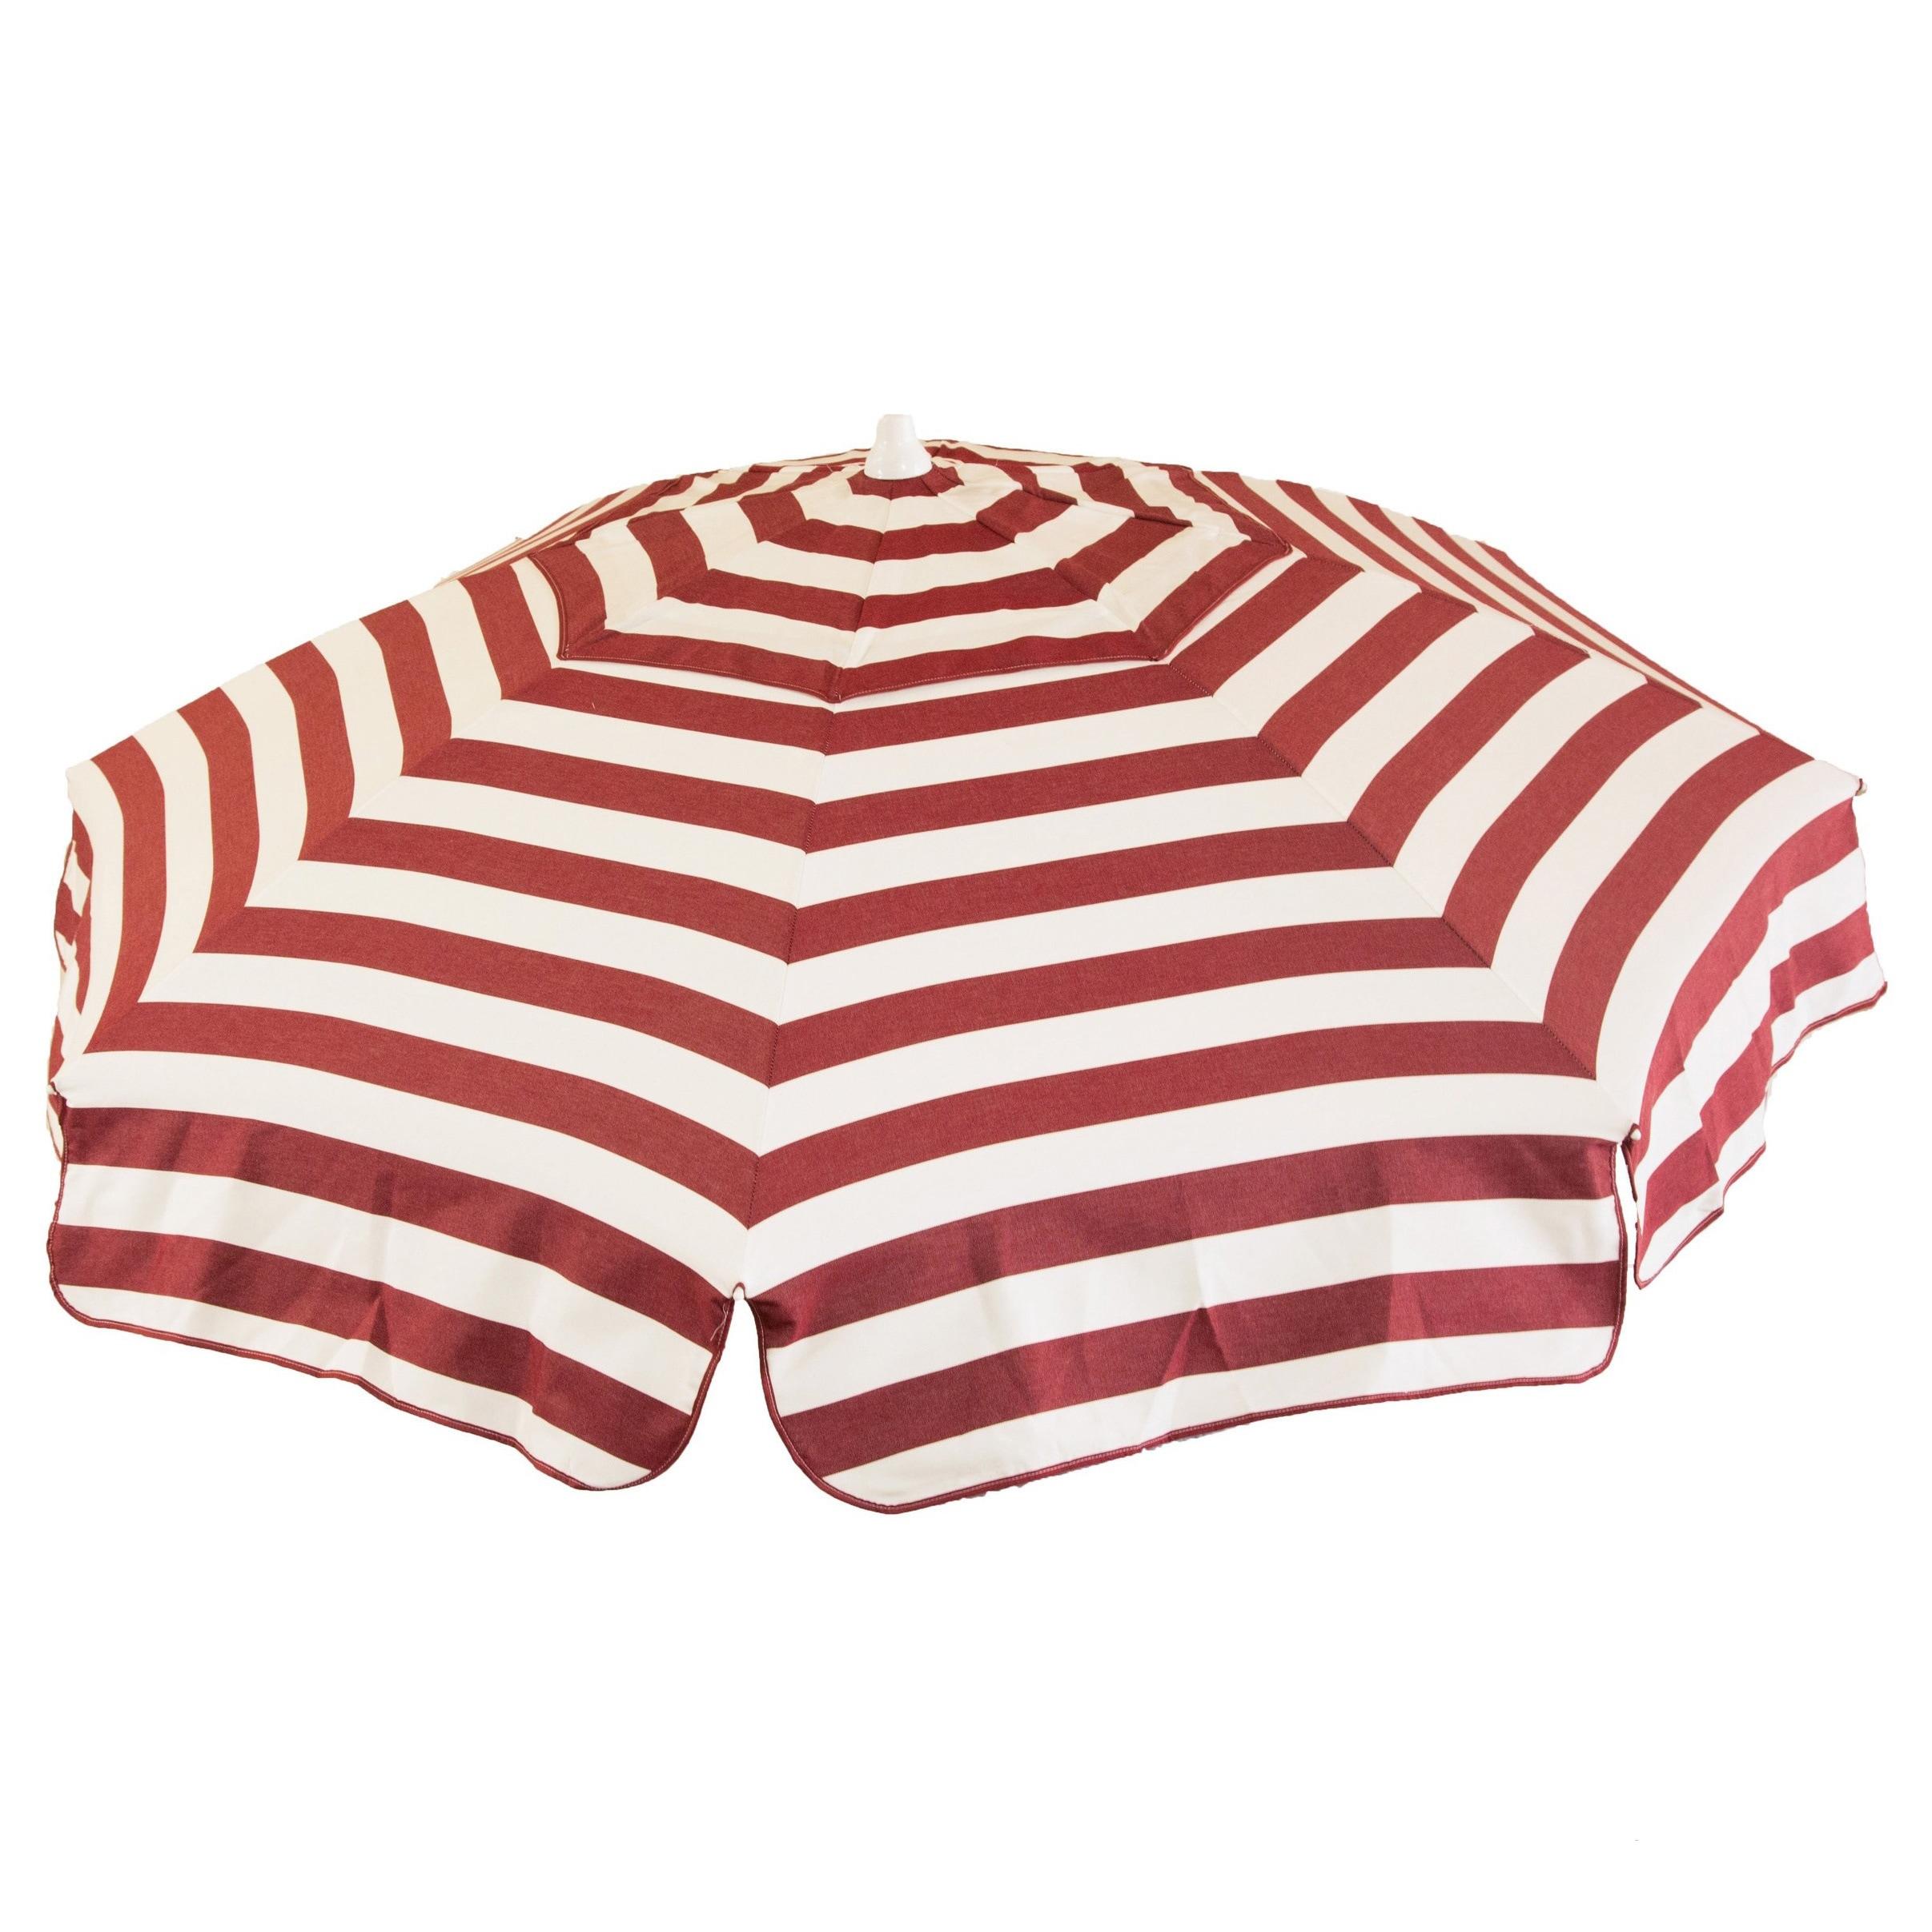 Italian Bistro 6 Foot Acrylic Striped Patio Umbrella   Free Shipping Today    Overstock.com   16983557